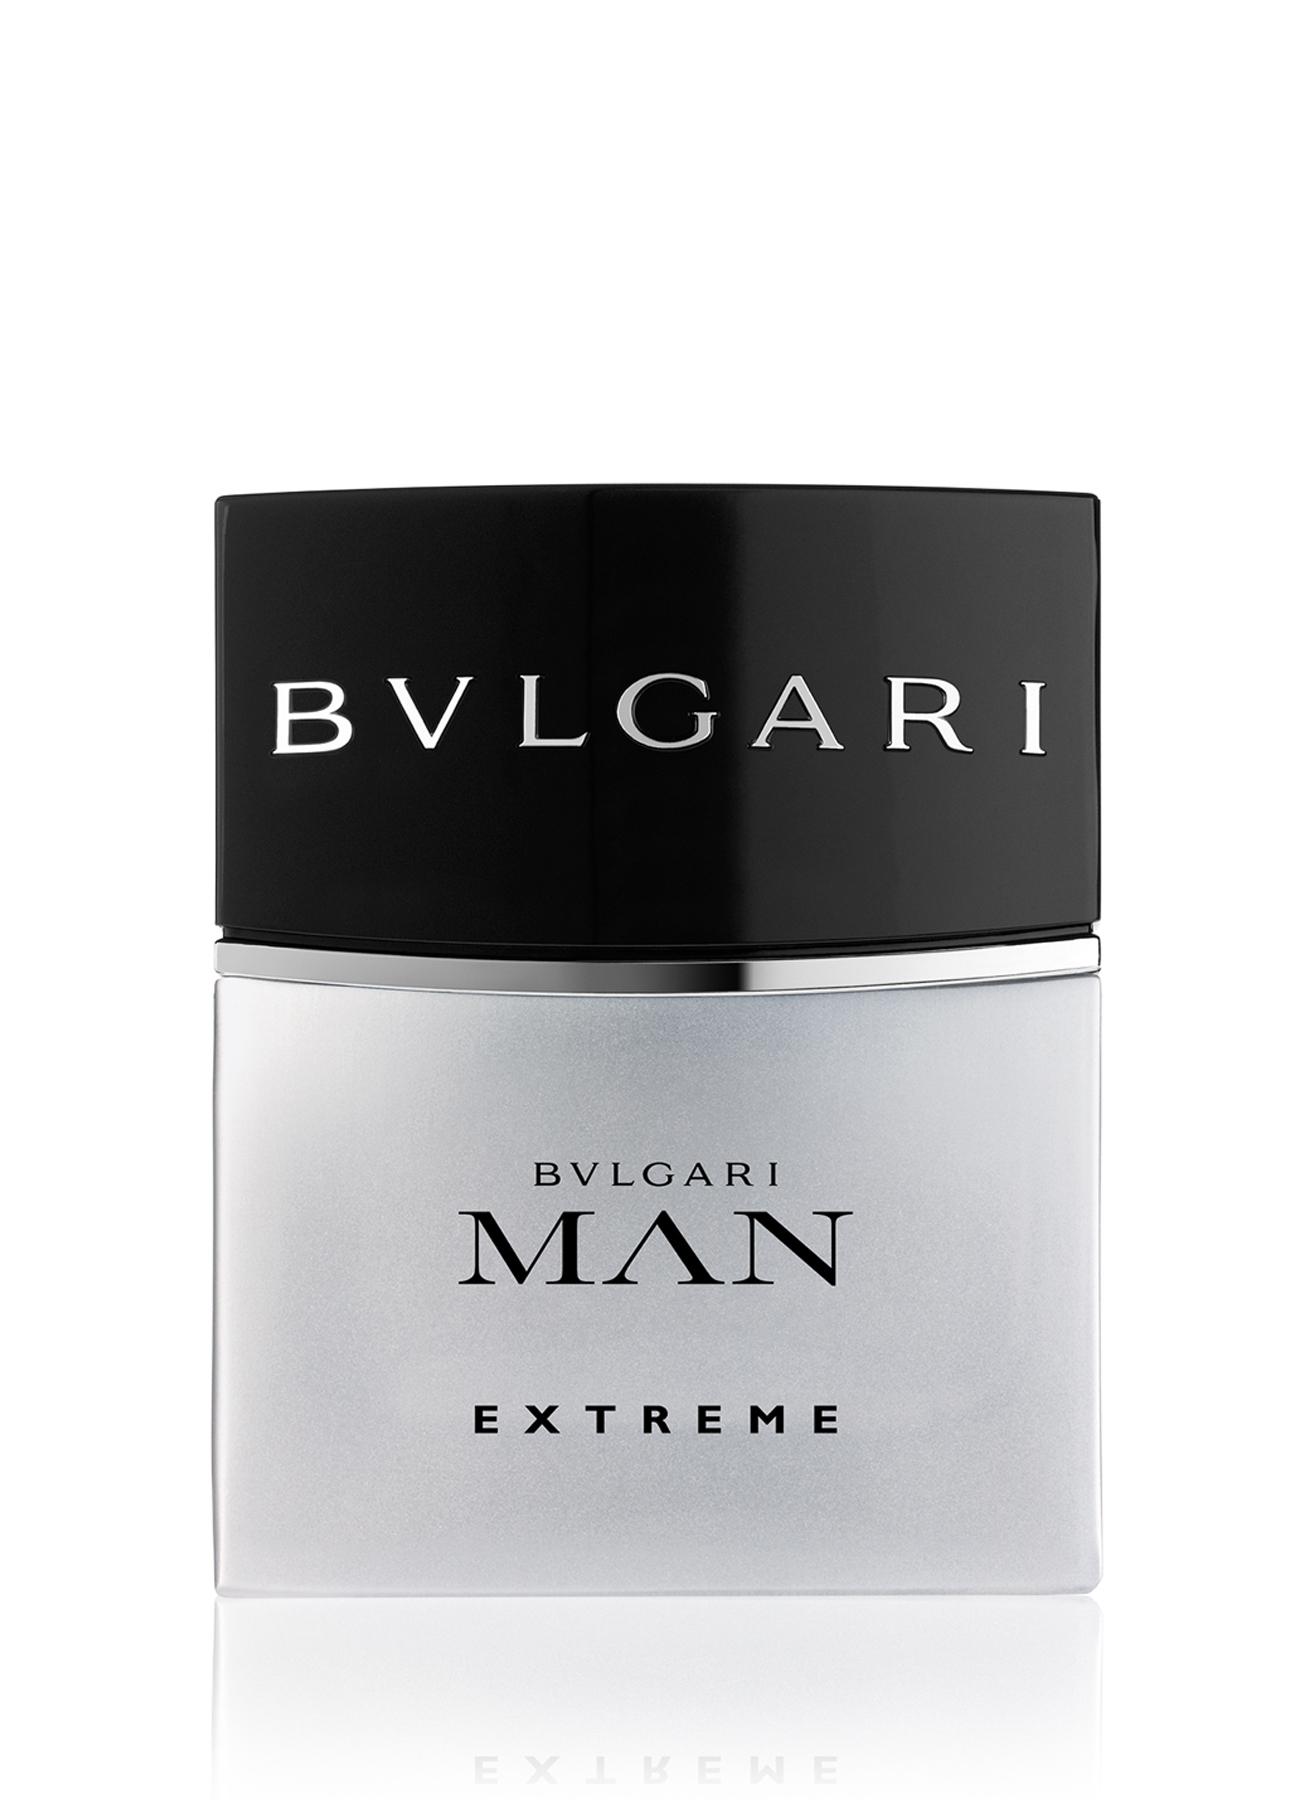 Bvlgari Man Extreme Edt 60 ml Erkek Parfüm 5000029490001 Ürün Resmi